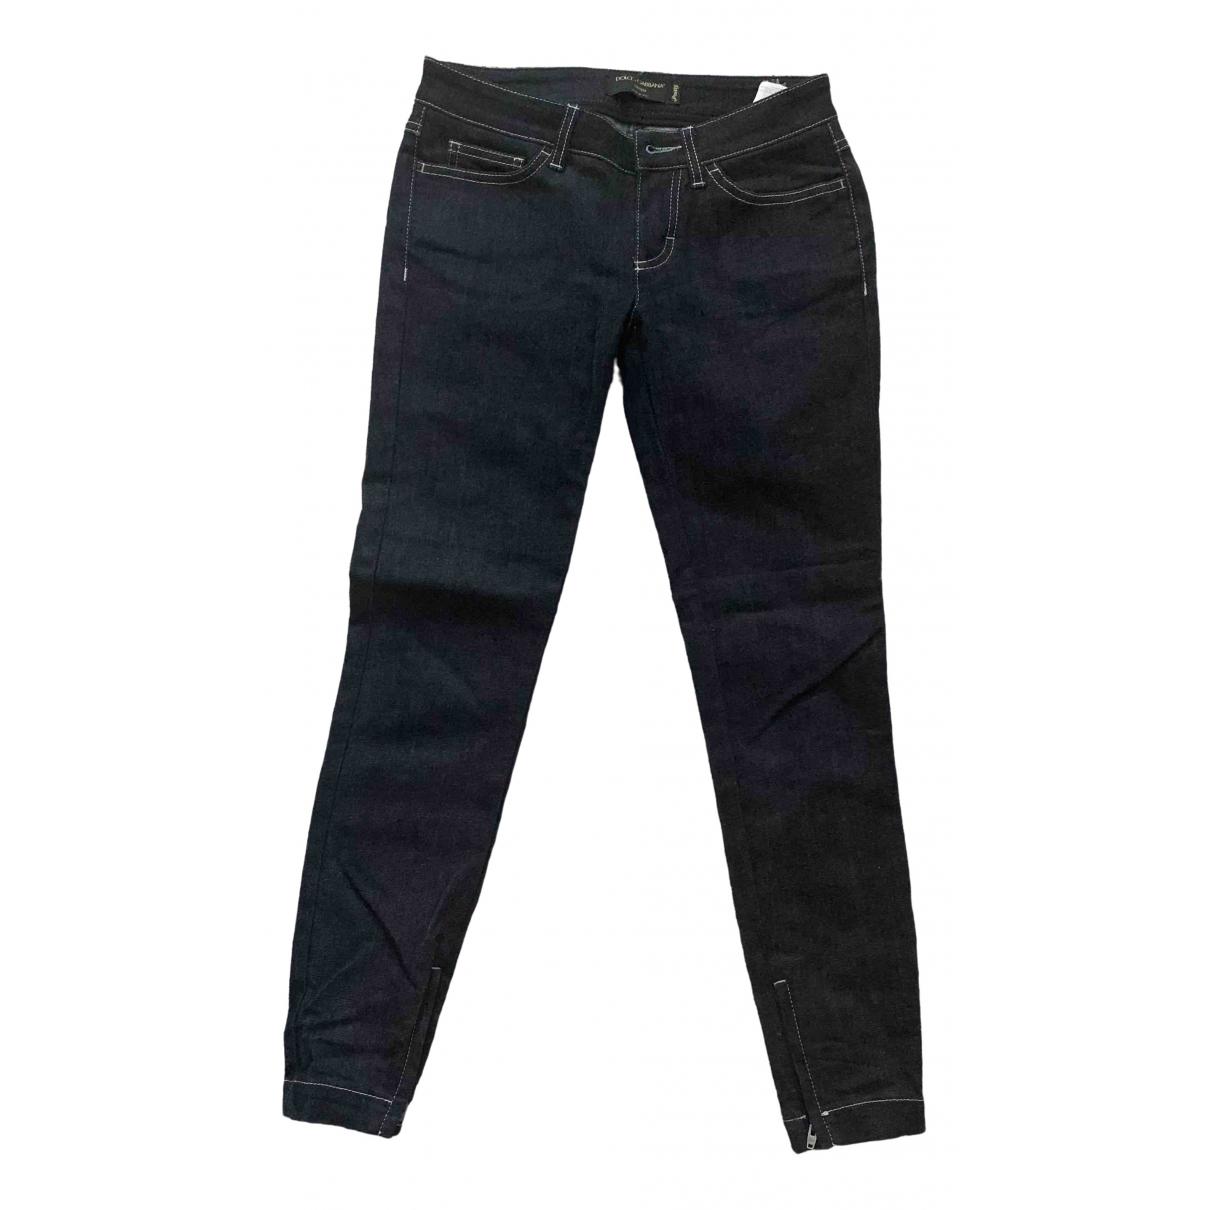 Dolce & Gabbana - Jean   pour femme en coton - elasthane - bleu